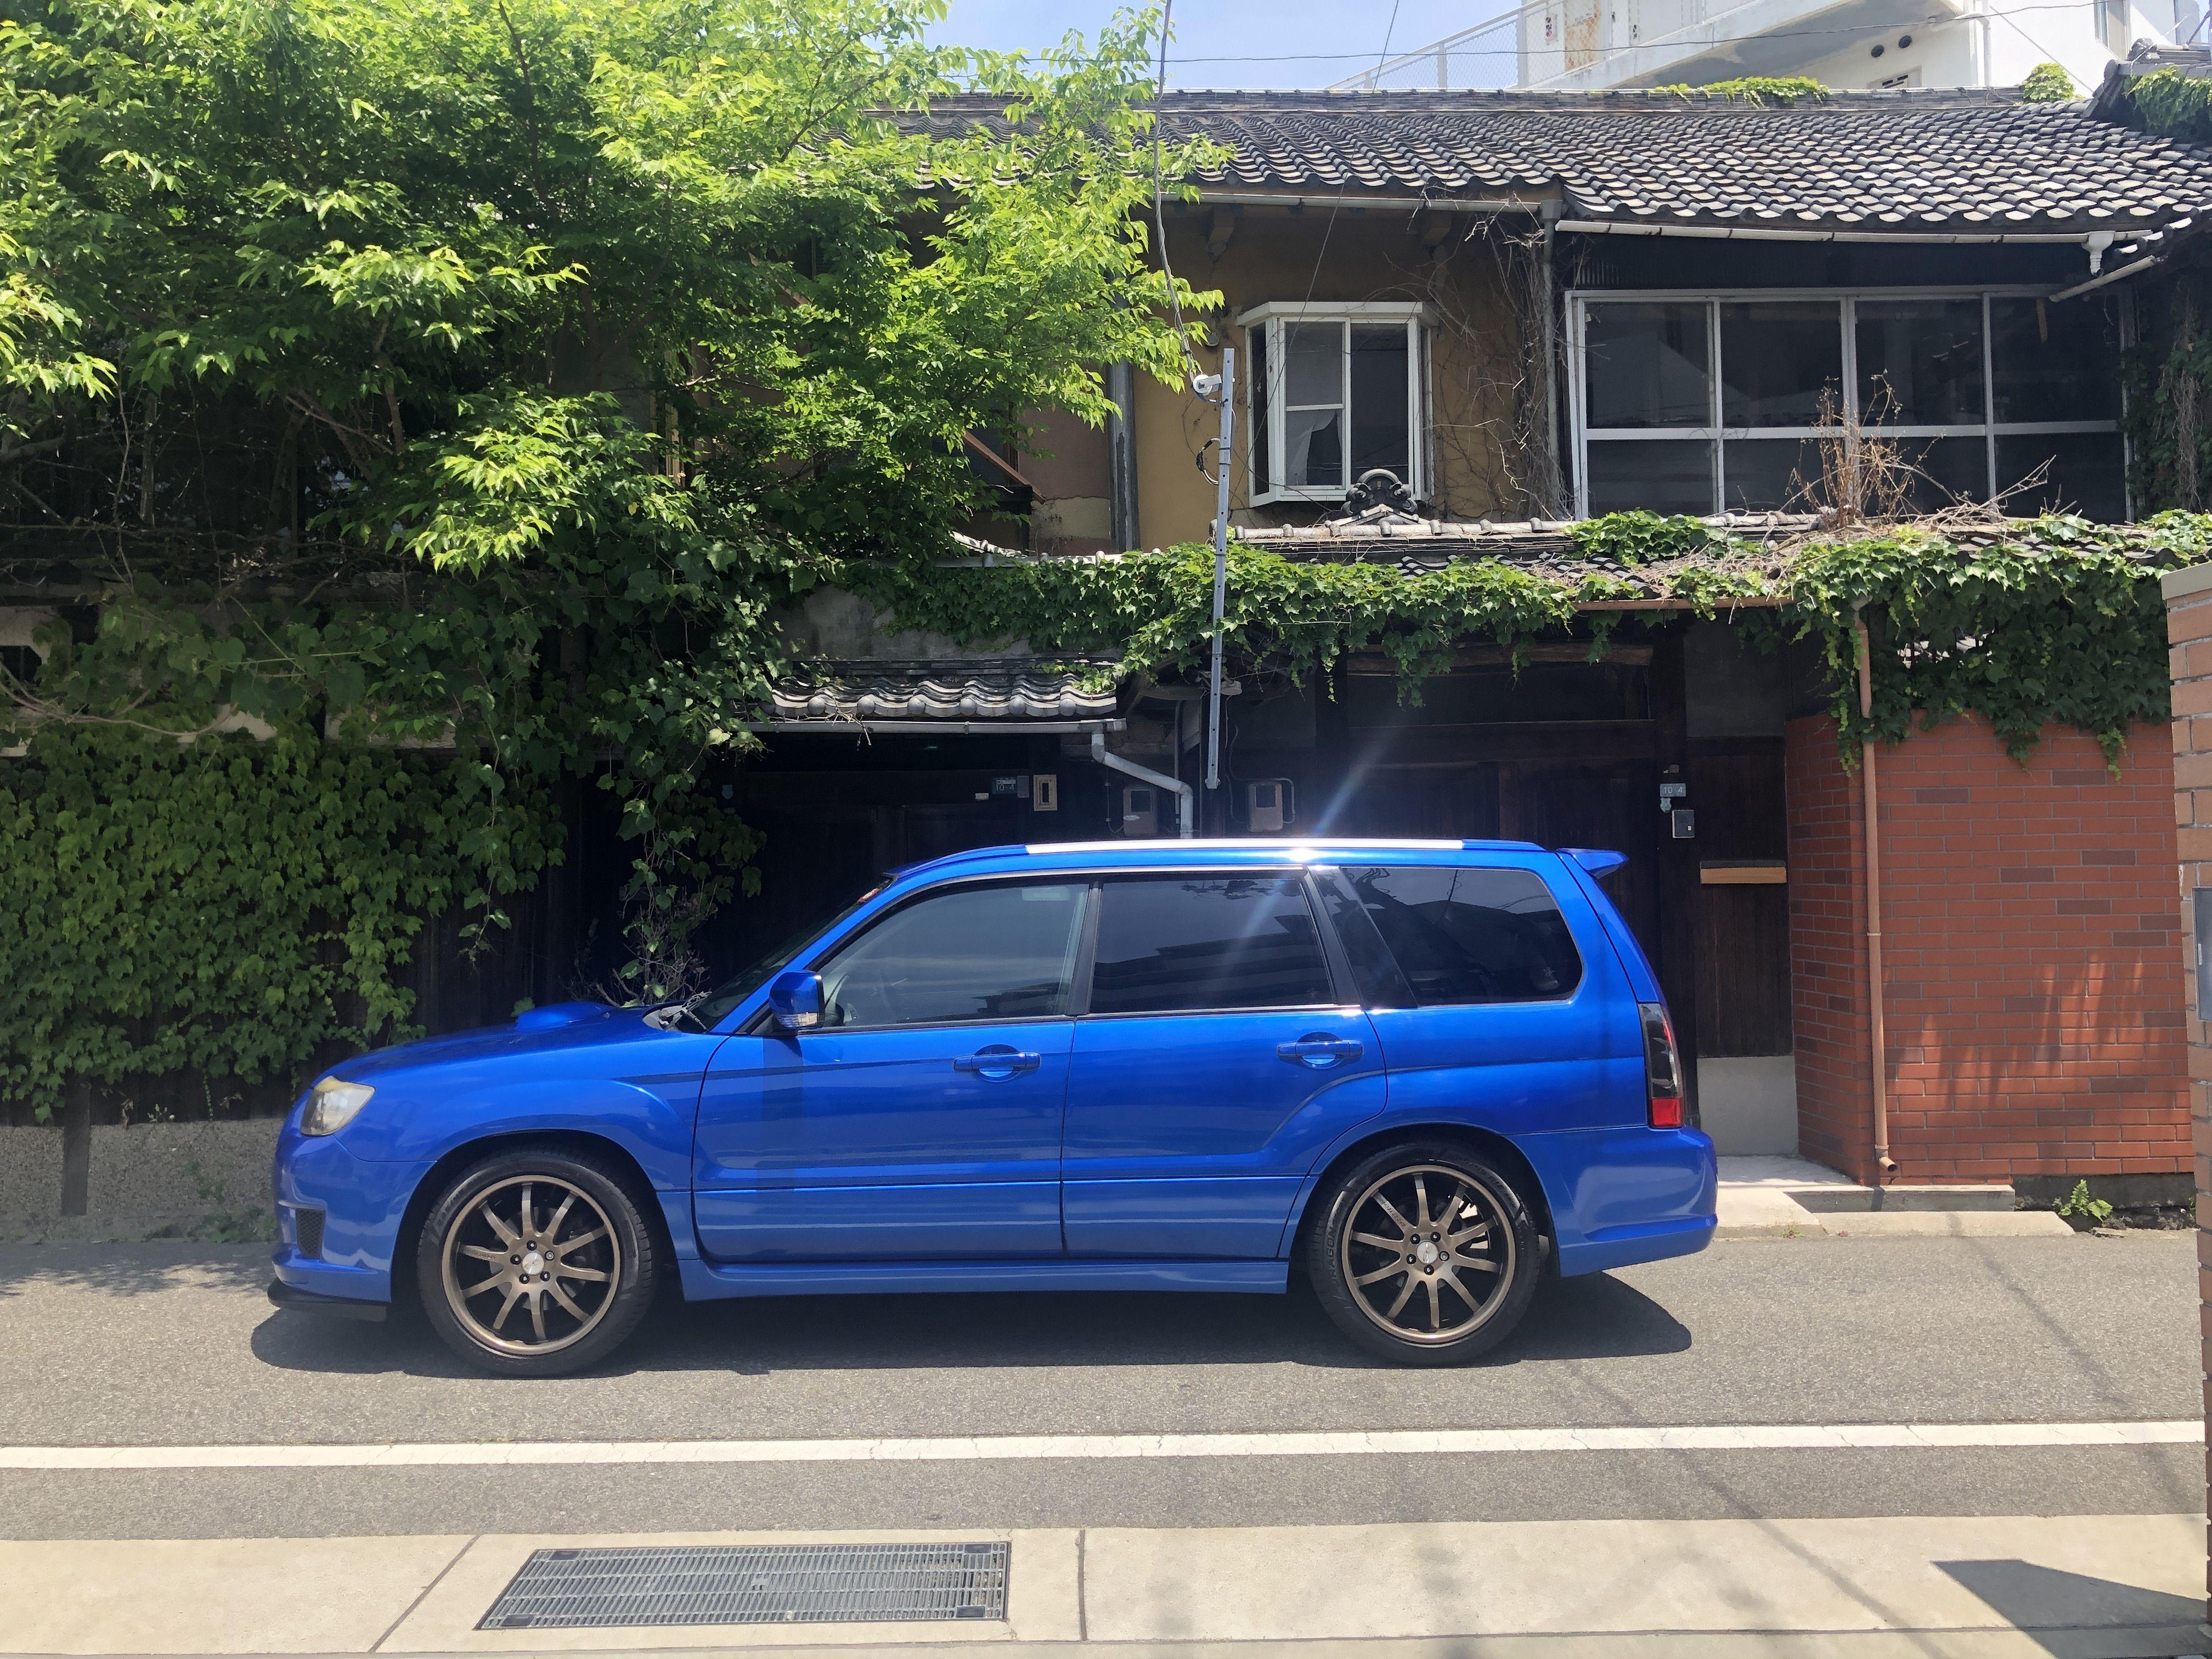 Subaru Forester Cross Sports S Edition【2020】